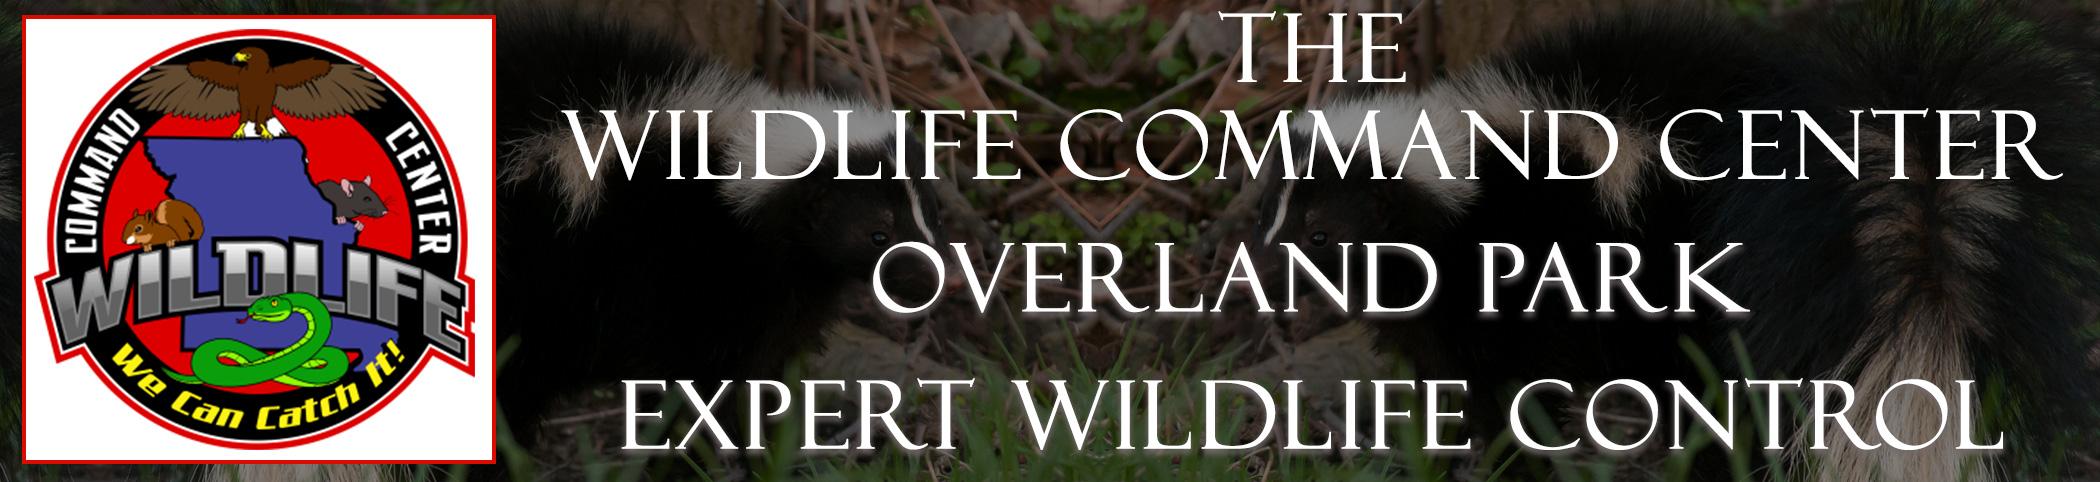 The Wildlife Command Center Overland Park Kansas Image